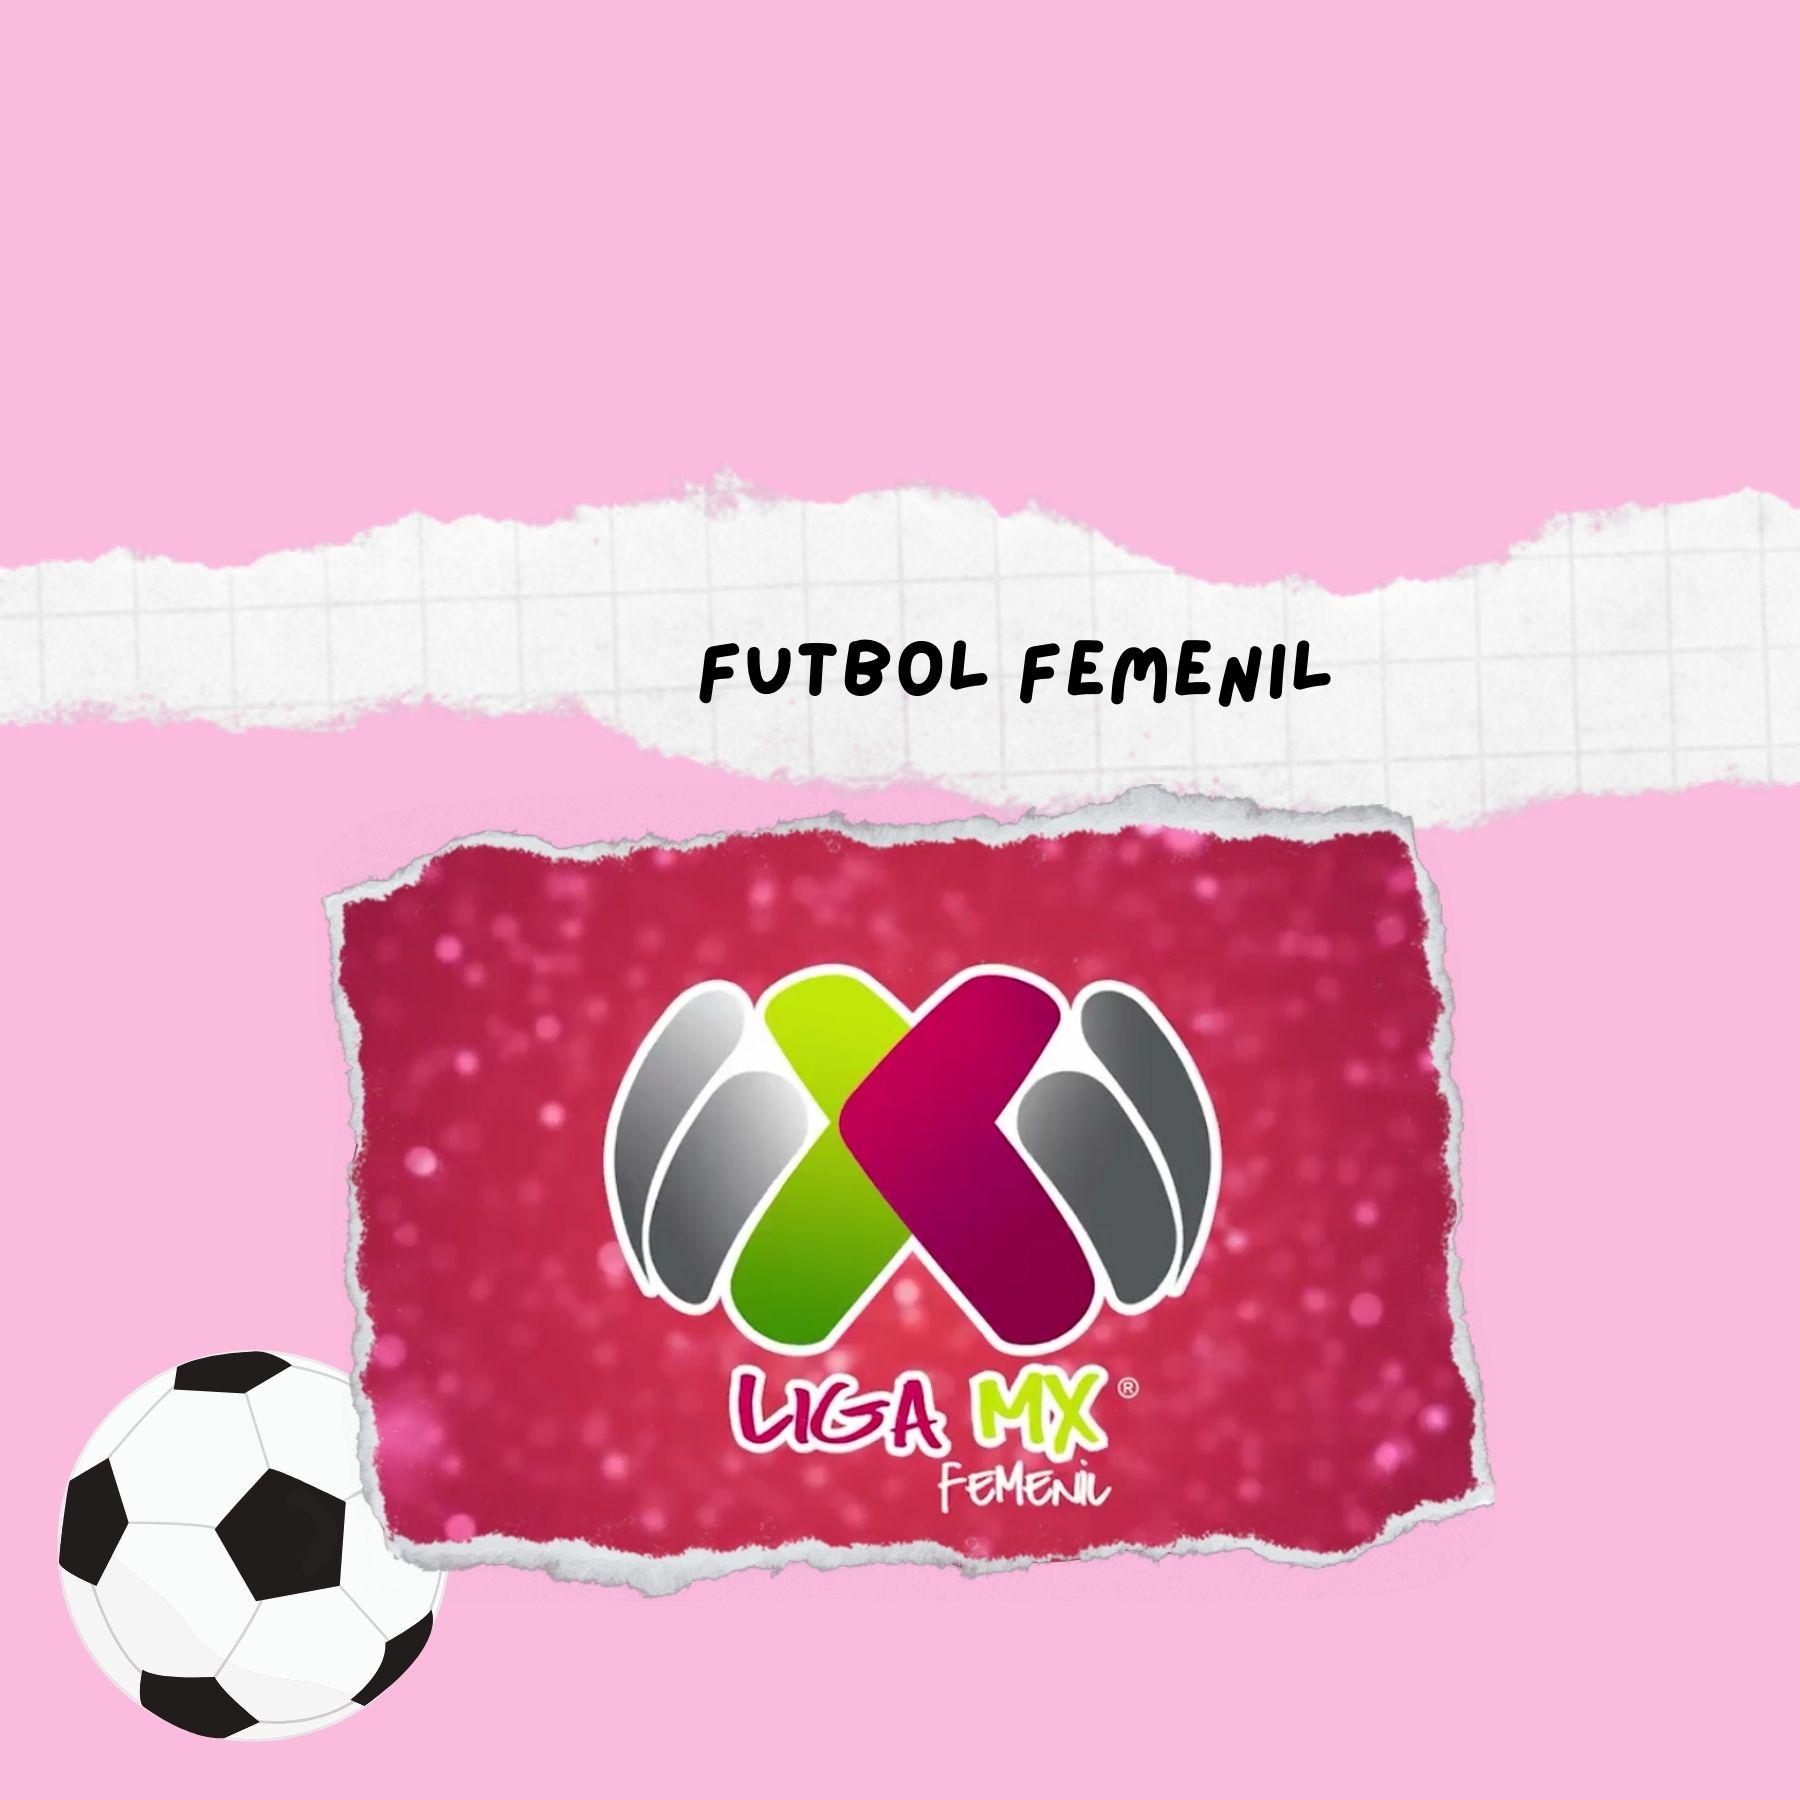 futbol femenil salarios